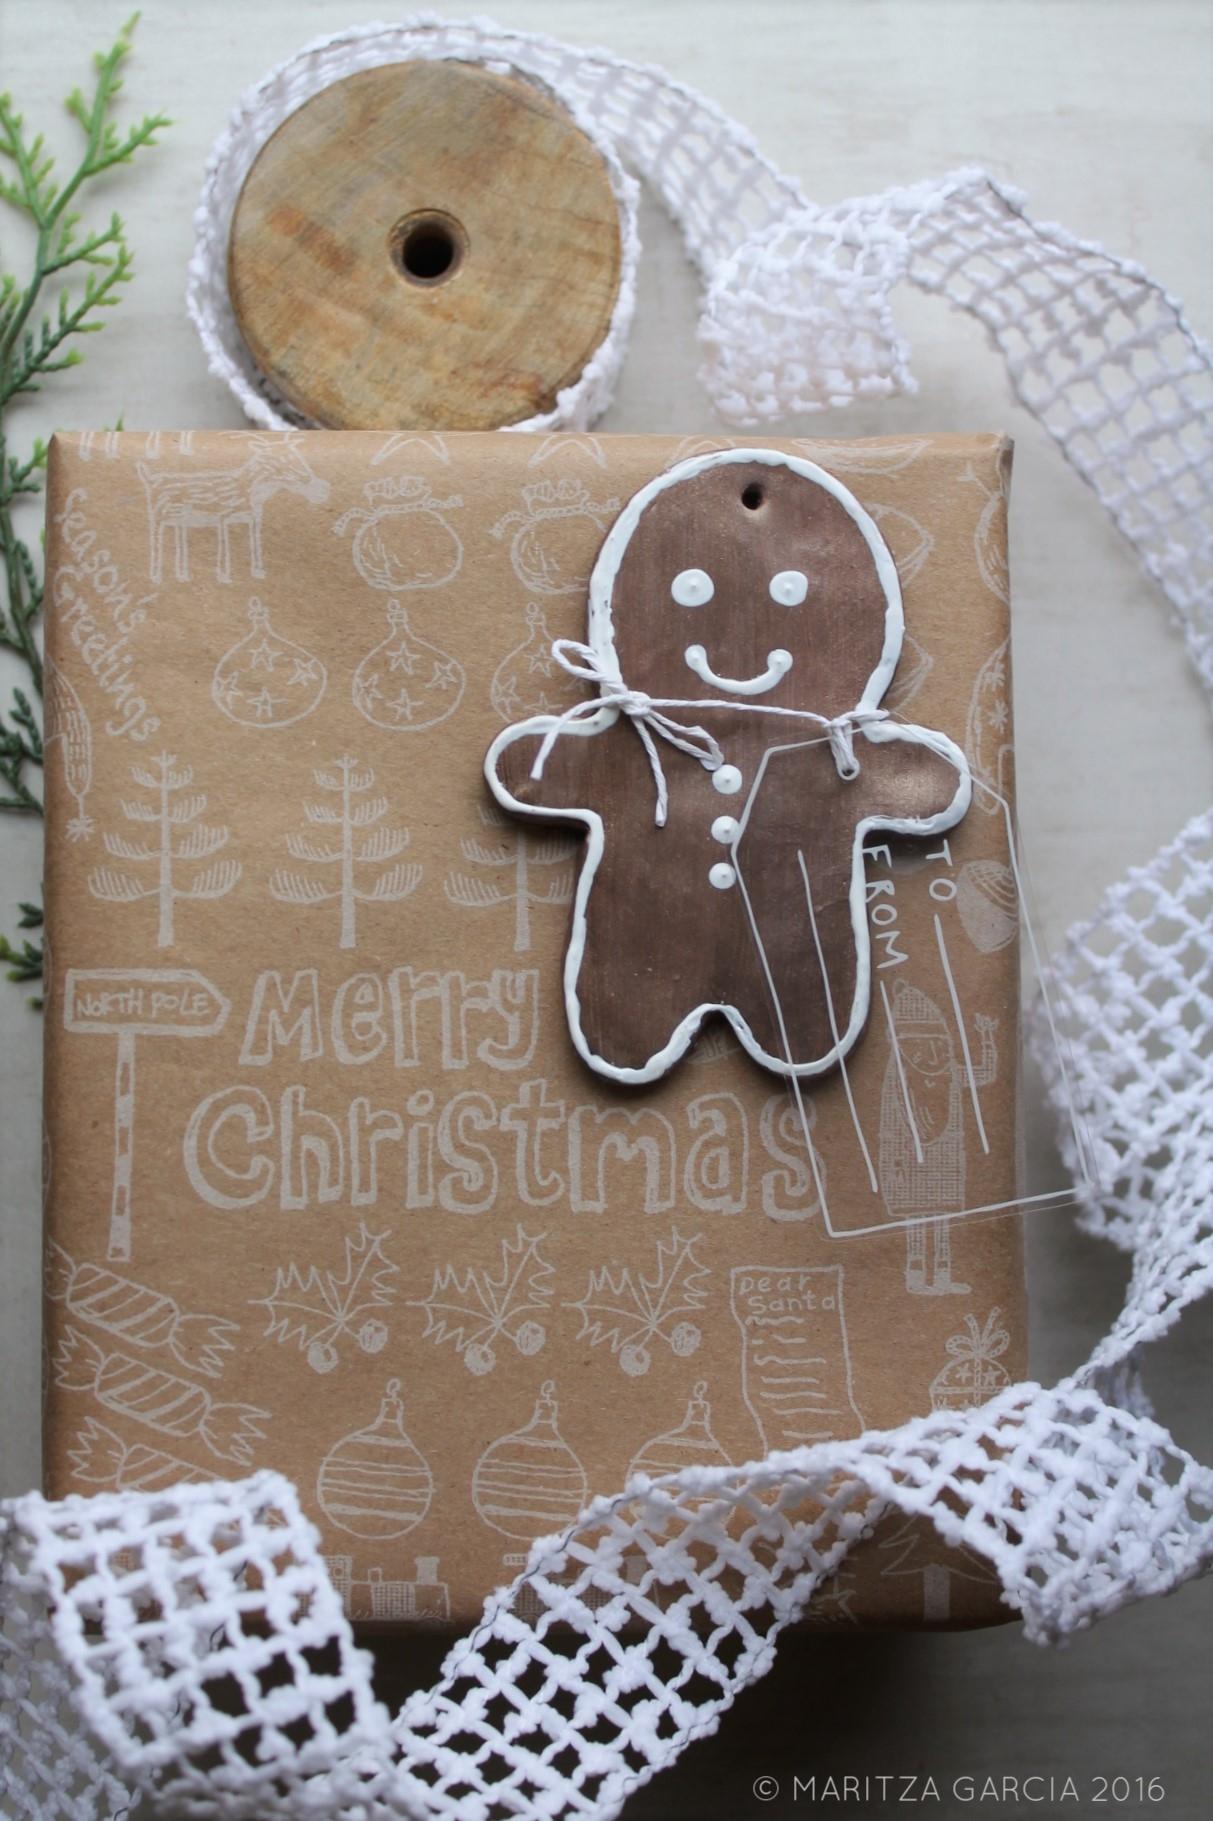 Merry Christmas   www.maritzagarcia.website